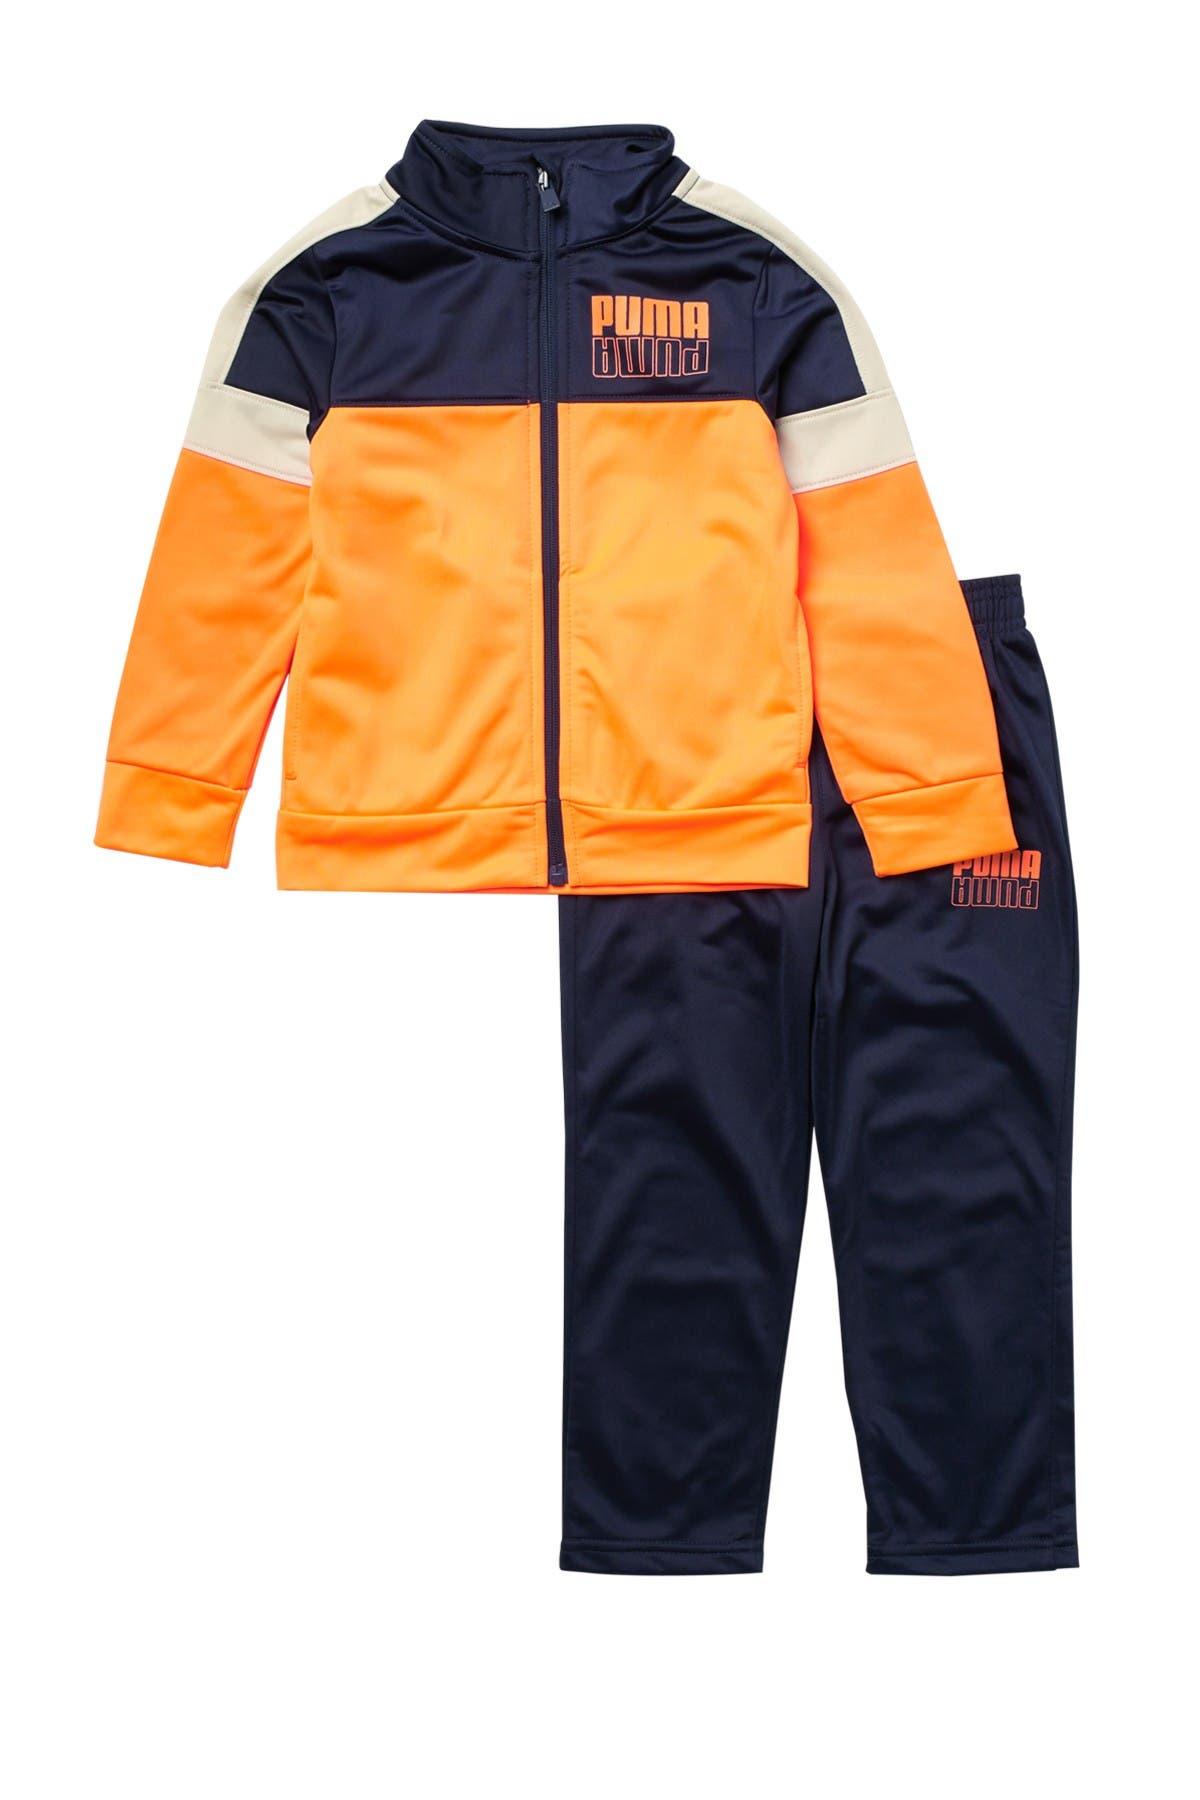 Image of PUMA Tricot 2-Piece Track Suit Set